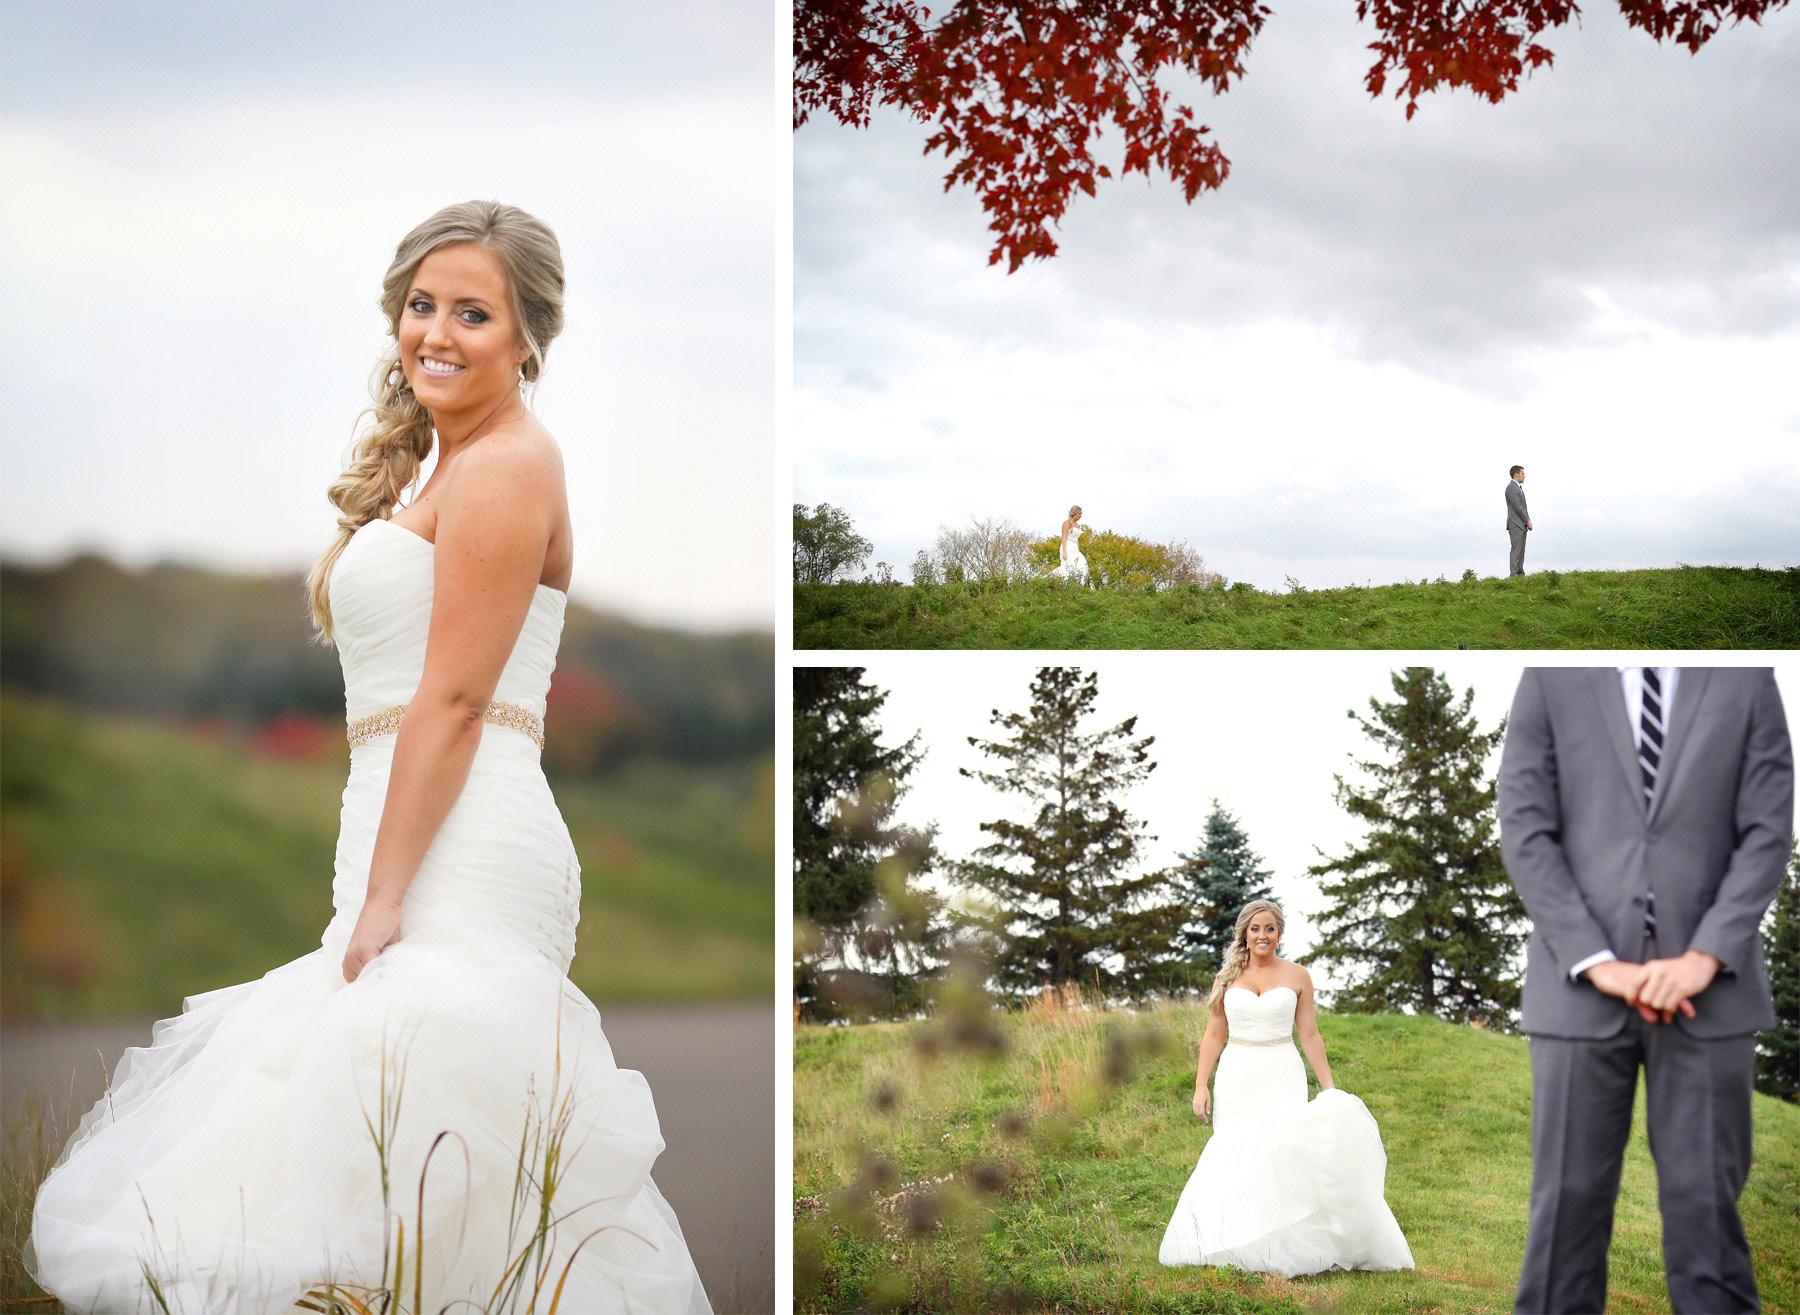 04-Stillwater-Minnesota-Wedding-Photographer-by-Andrew-Vick-Photography-Fall-Autumn-StoneRidge-Golf-Club-First-Meeting-Look-Bride-Groom-Hills-Field-Micaela-and-Derek.jpg